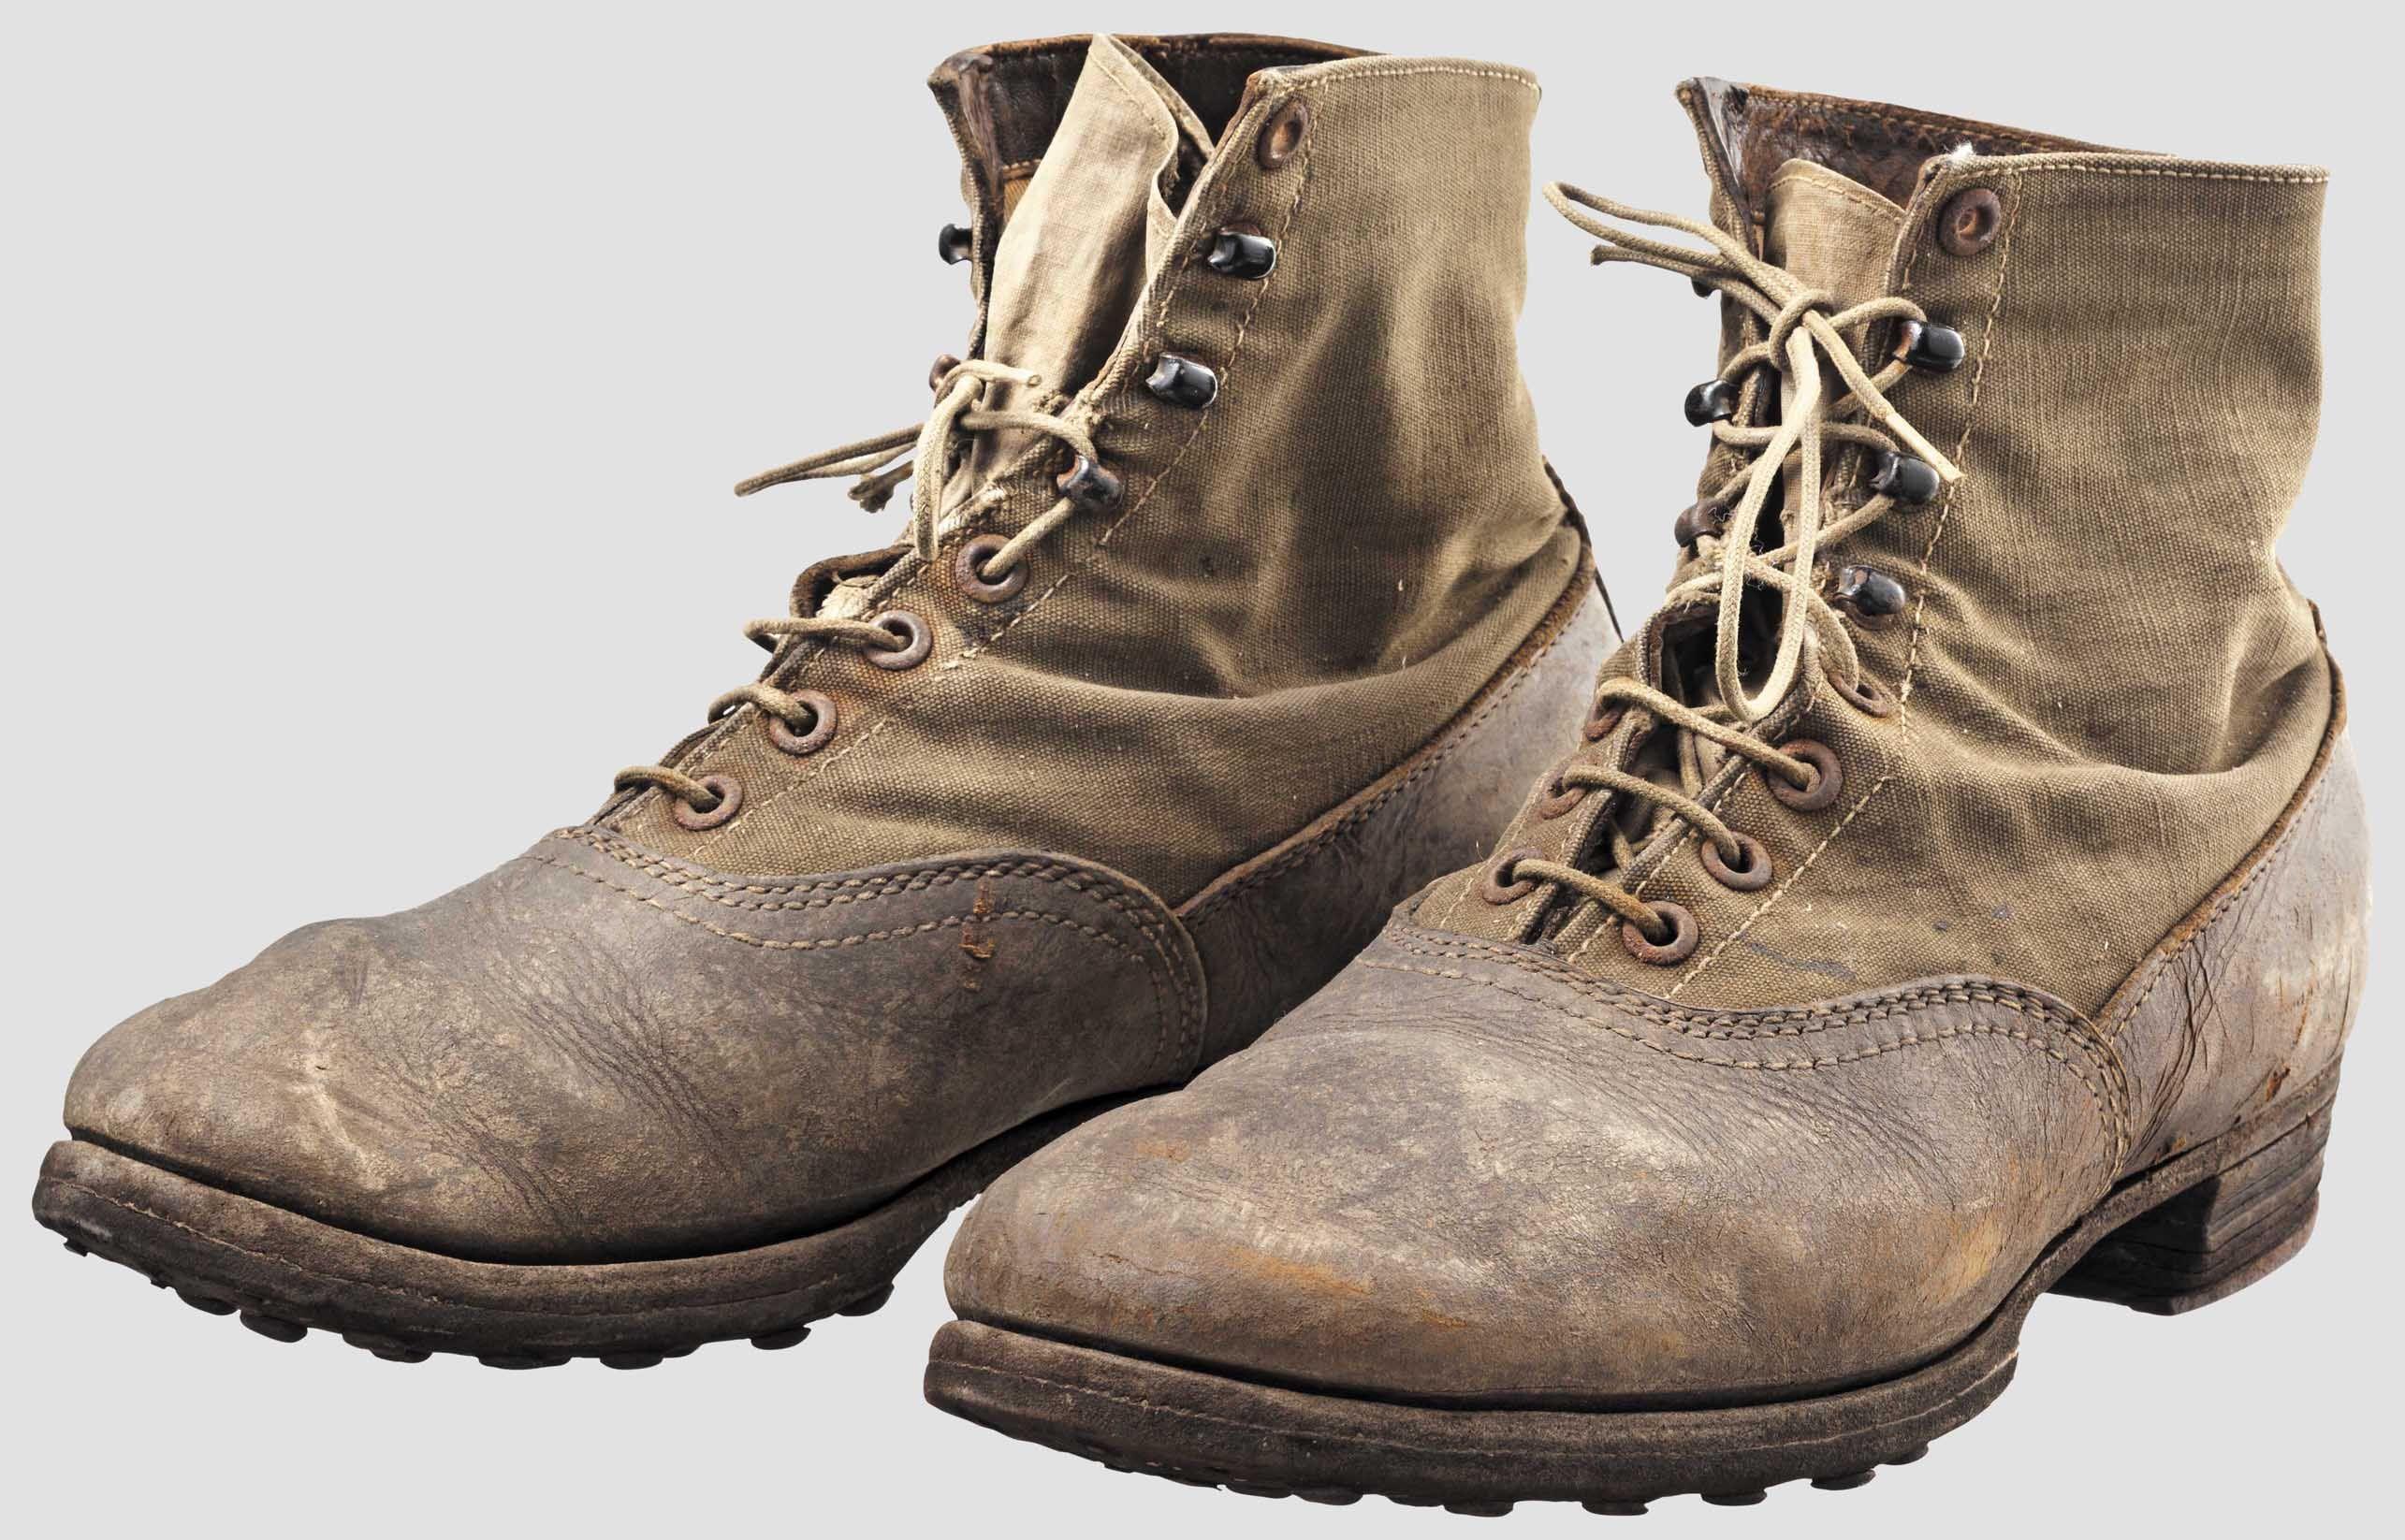 DAK botas | DAK Uniform and Gear 1941 1943 (COLOR